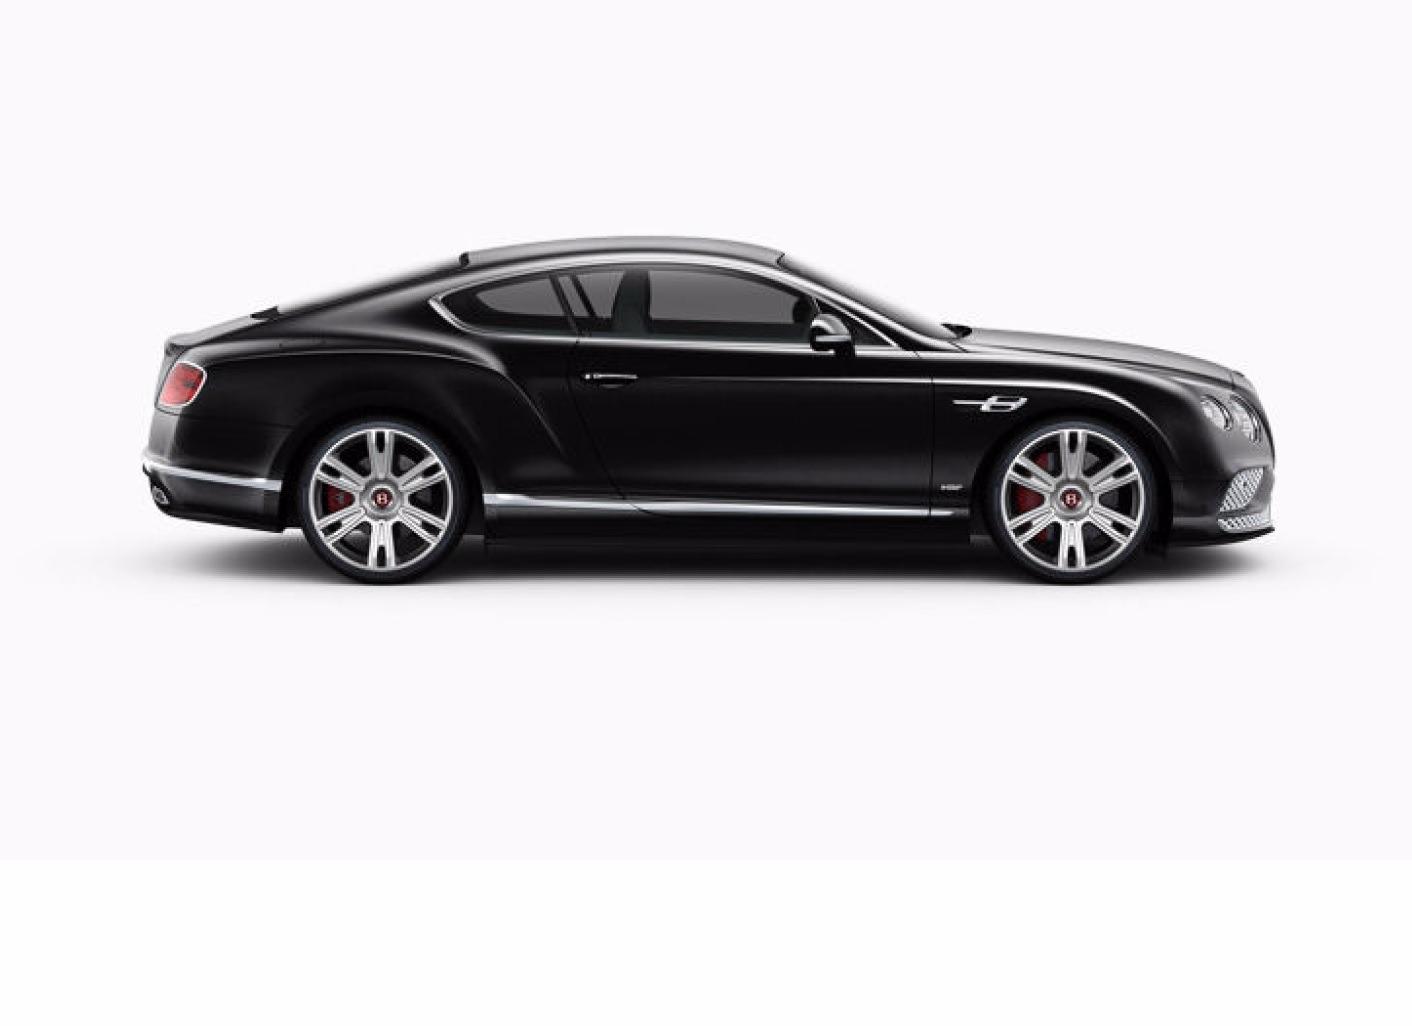 Magnolia Auto Group >> 2017 Bentley Continental GT V8S Stock # 7NGT for sale near Vienna, VA | VA Bentley Dealer For ...